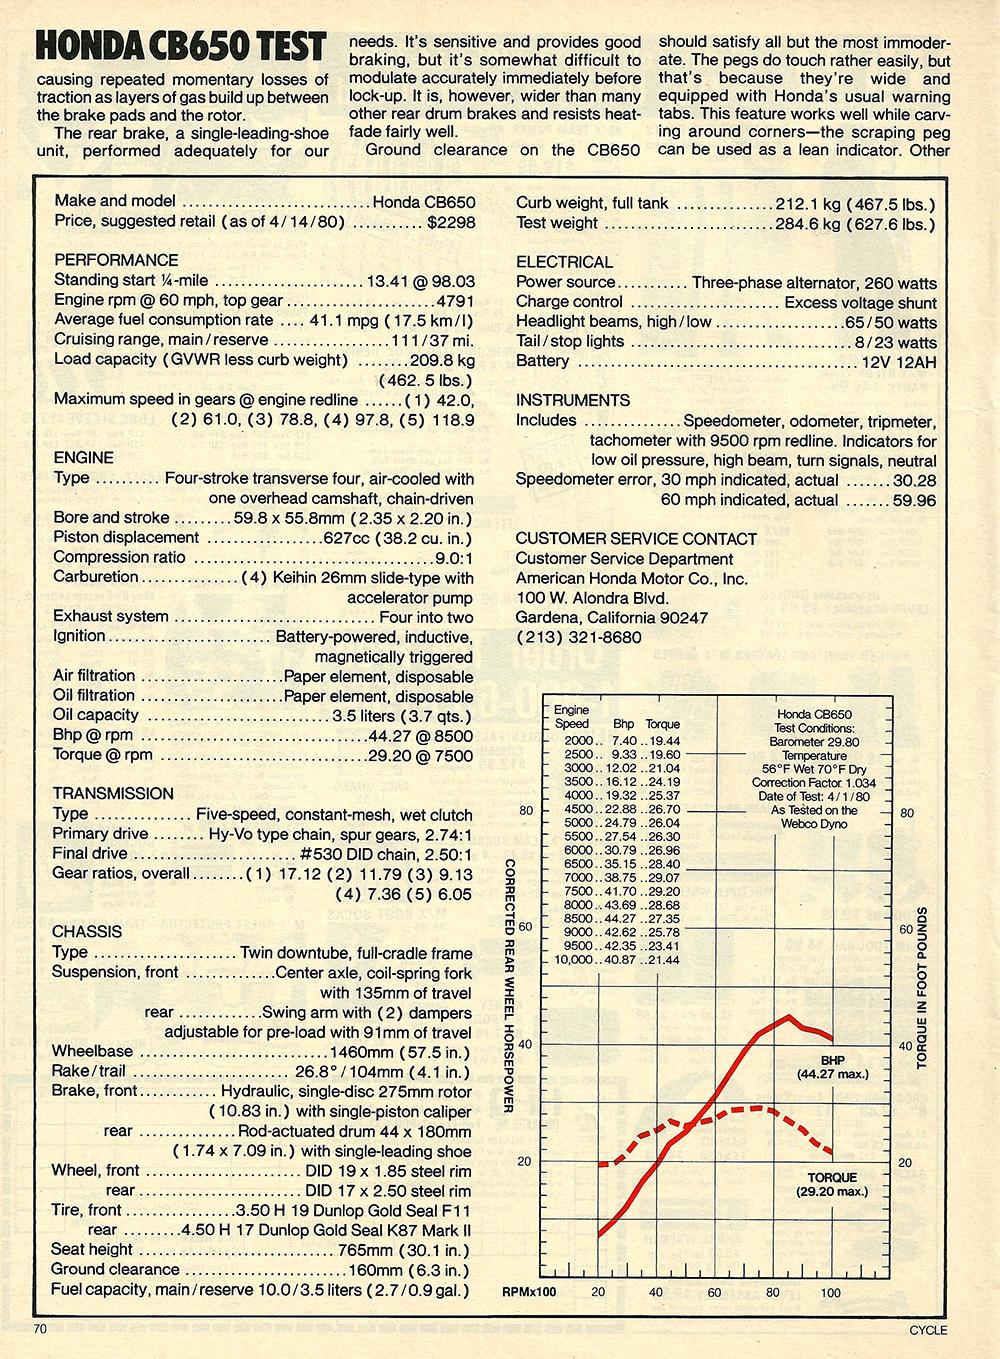 1980 Honda CB650 road test 06.jpg